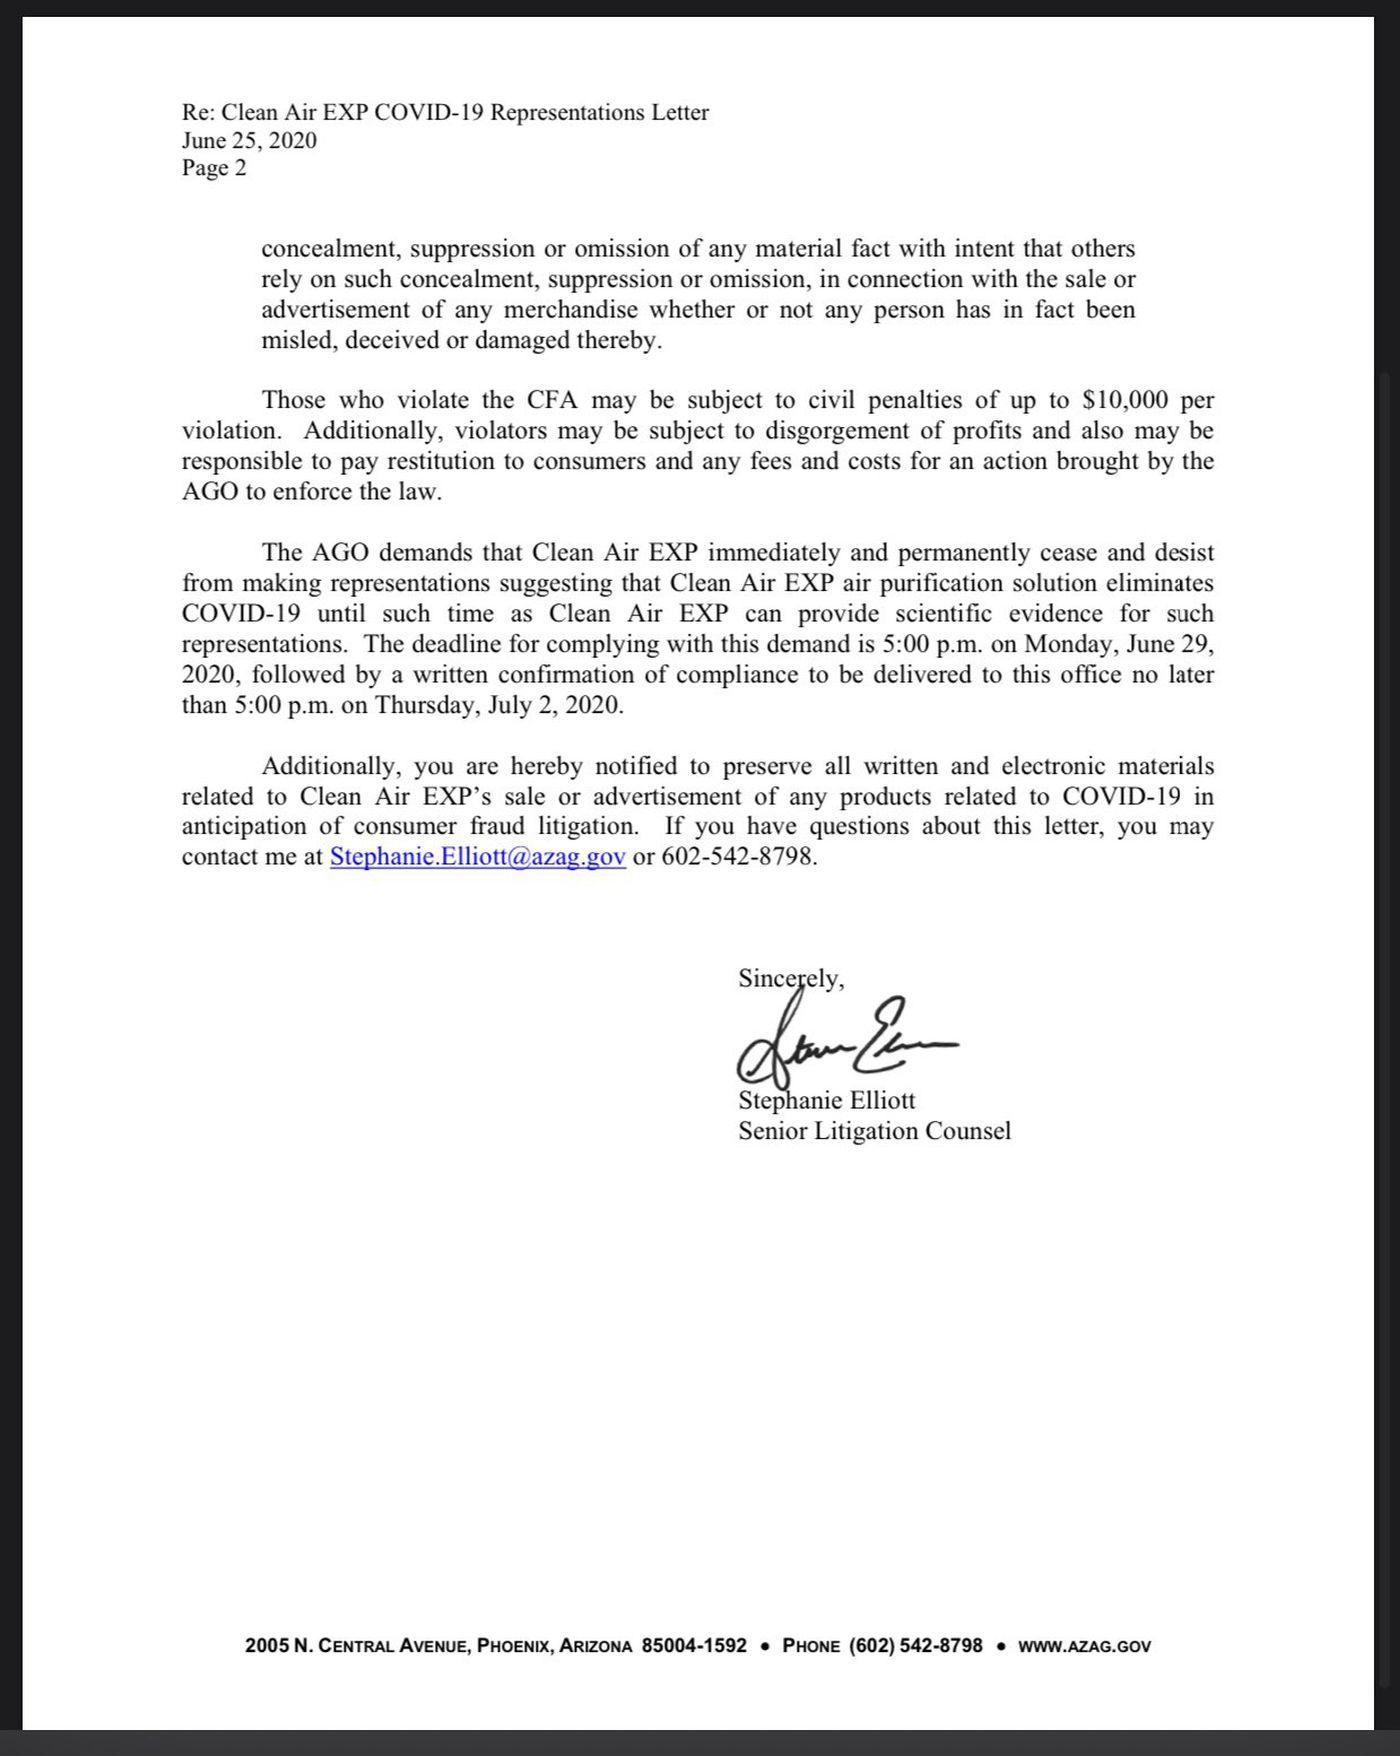 Arizona Attorney General s Office Sends Cease And Desist